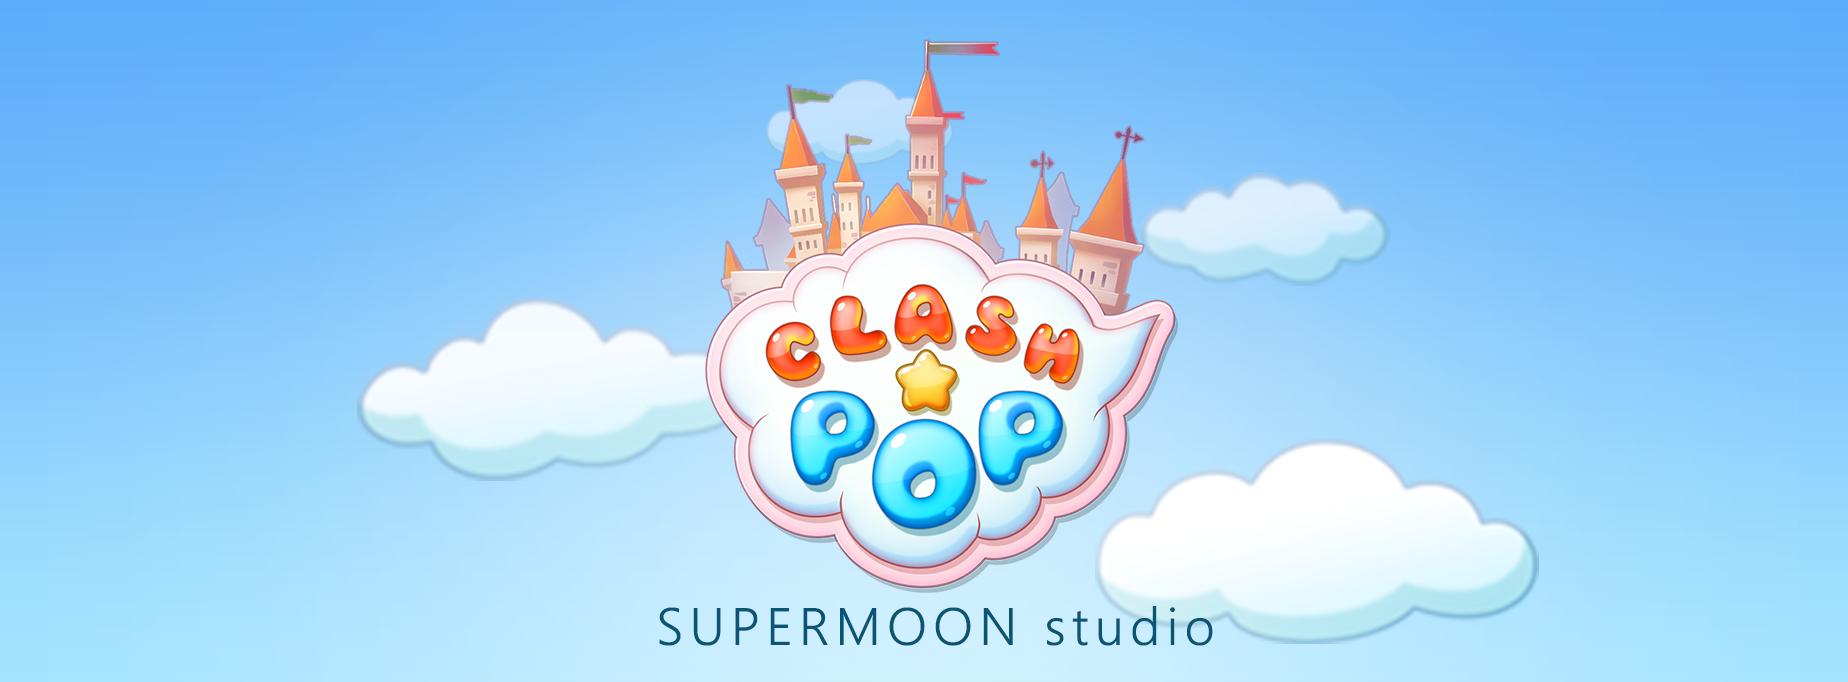 [MWU Korea '18] Clash Pop / Supermoon Studio